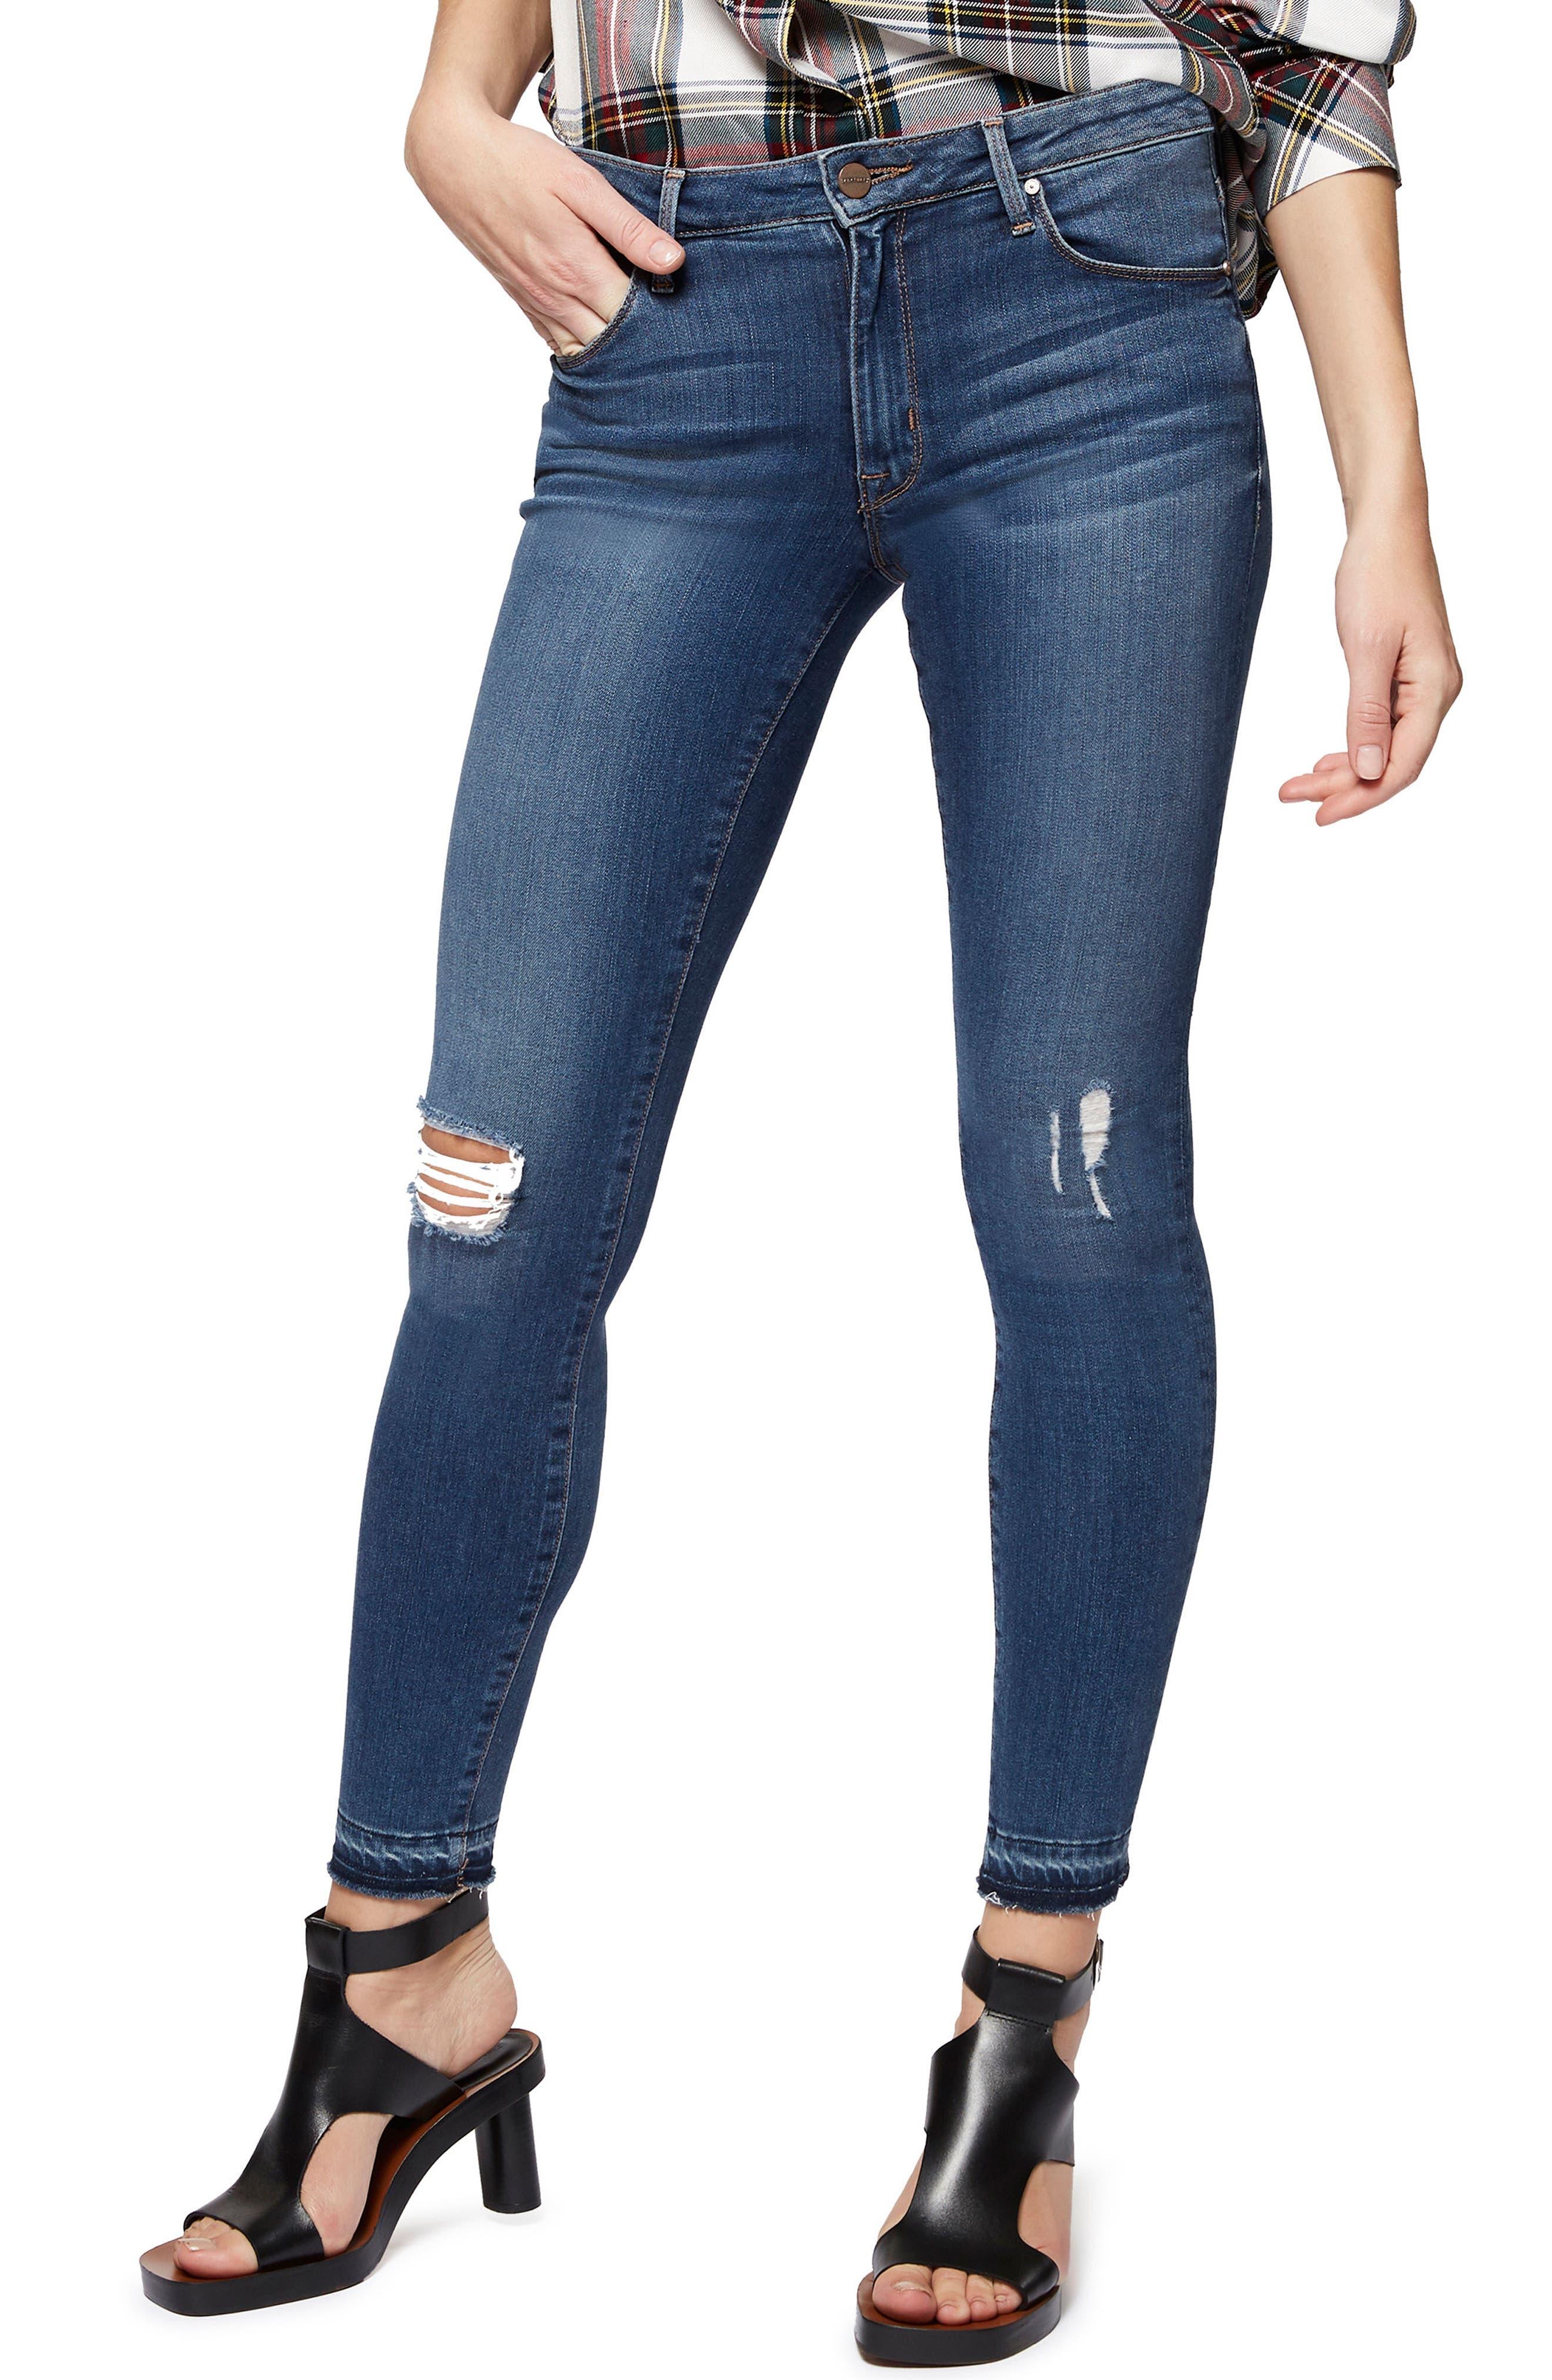 Robbie High Waist Skinny Jeans,                         Main,                         color, 421